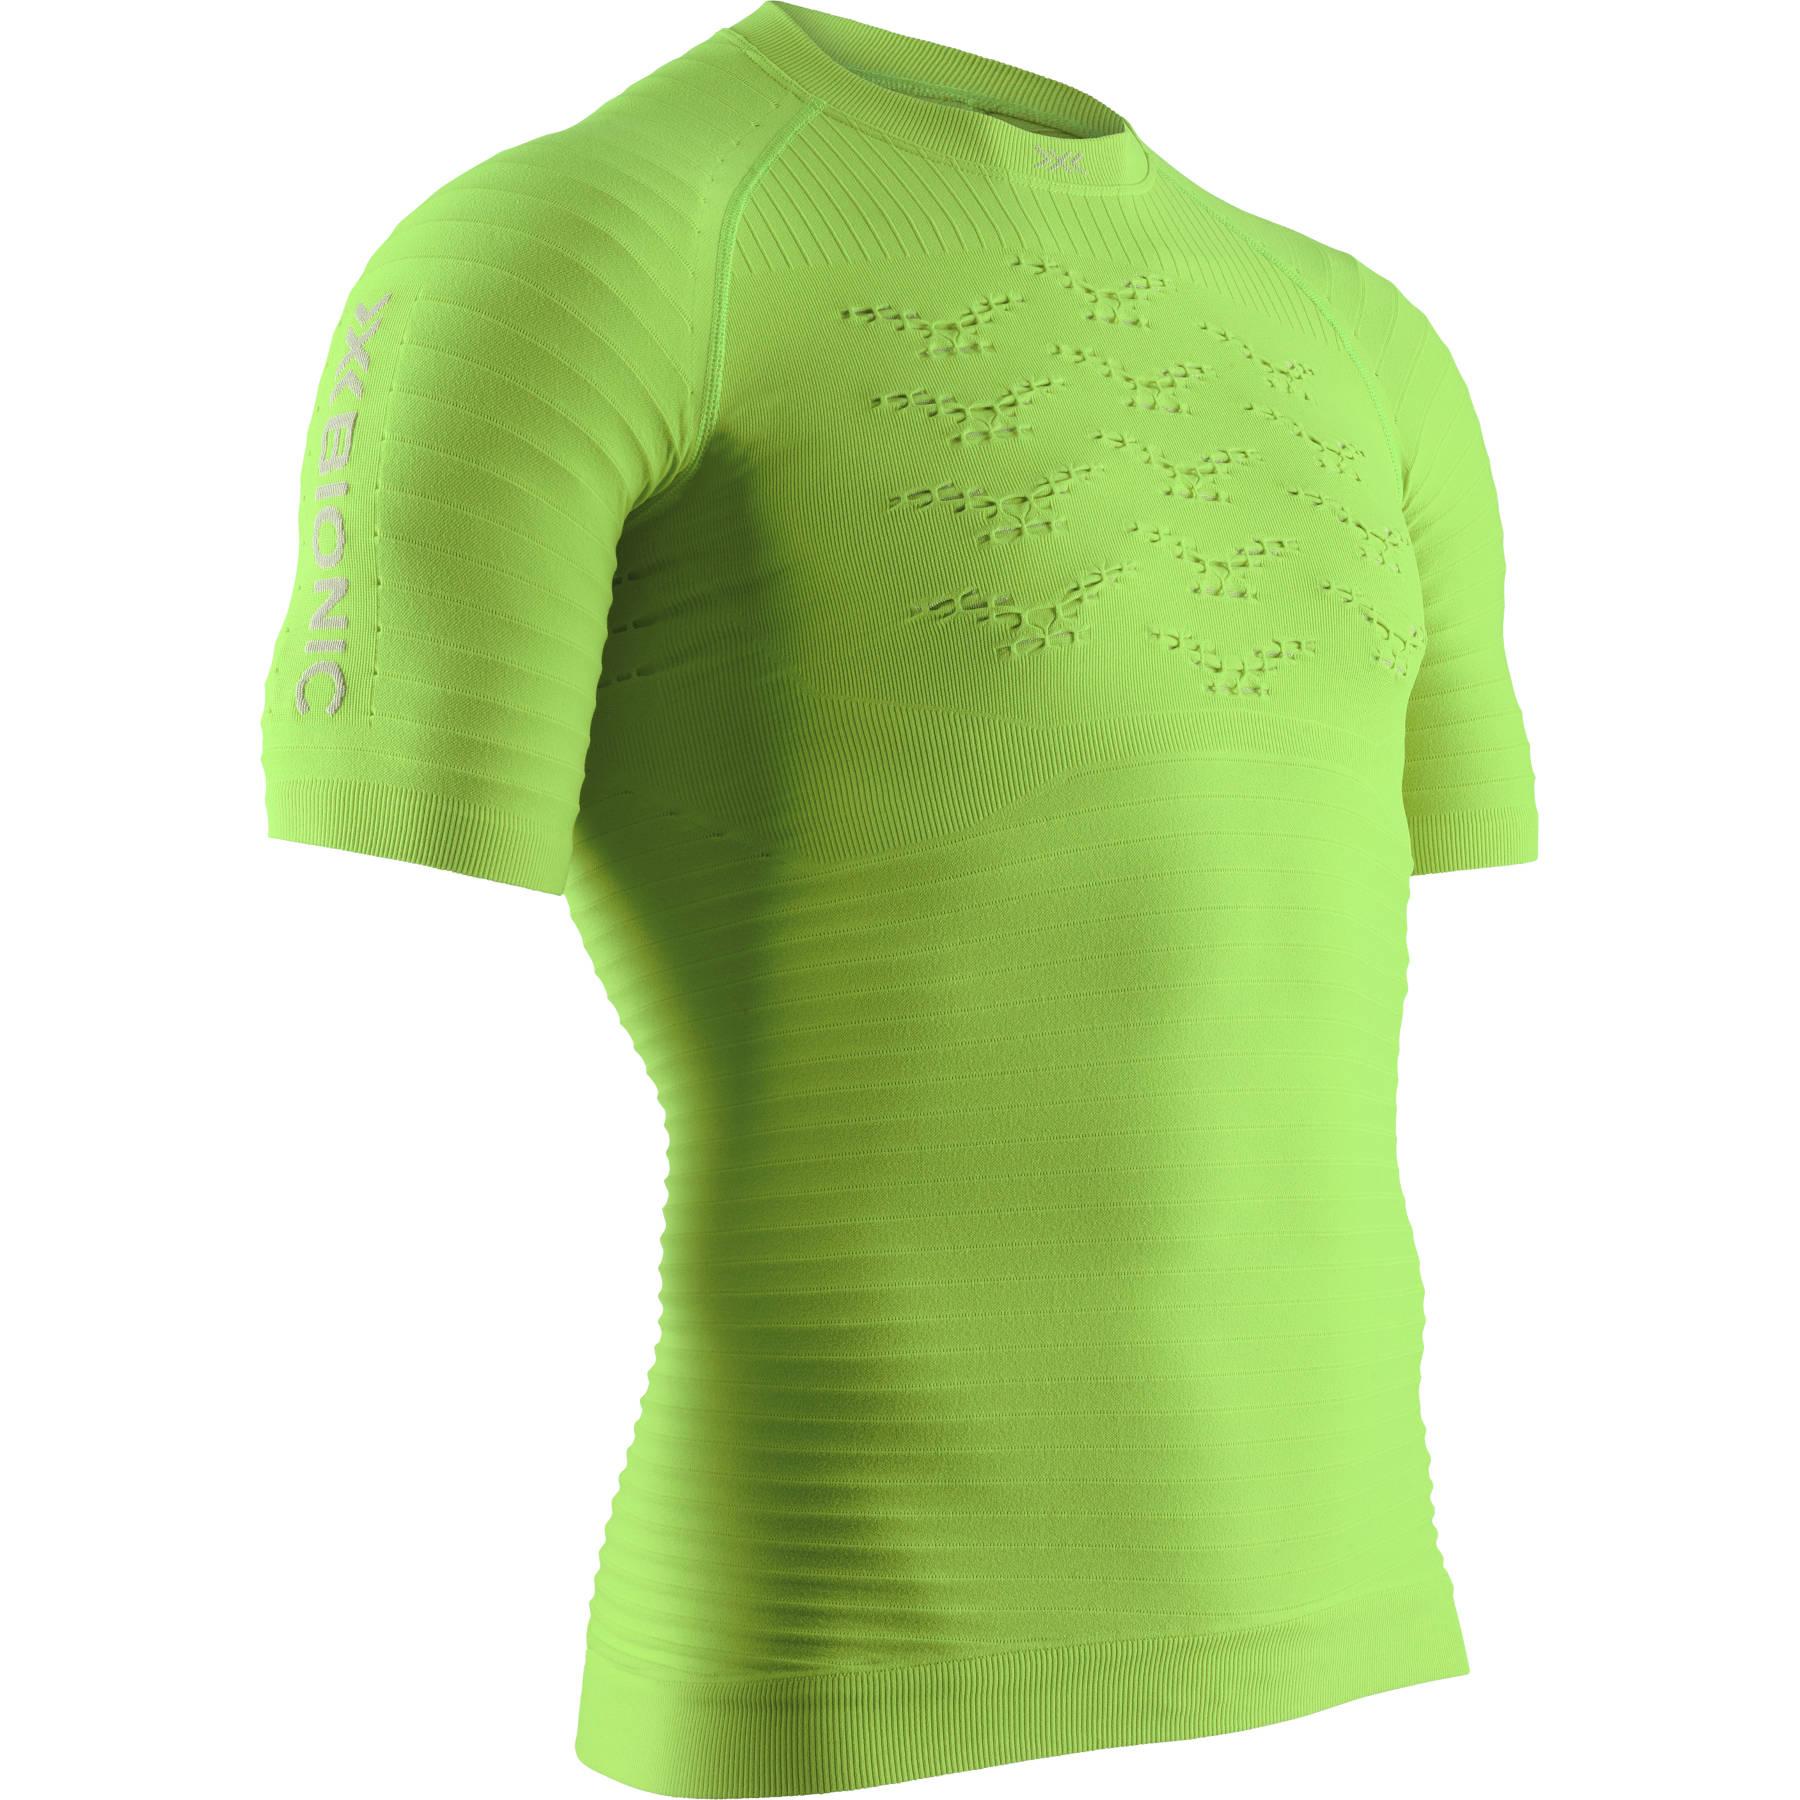 X-Bionic Effektor 4.0 Run Kurzarm-Laufshirt für Herren - effektor green/arctic white